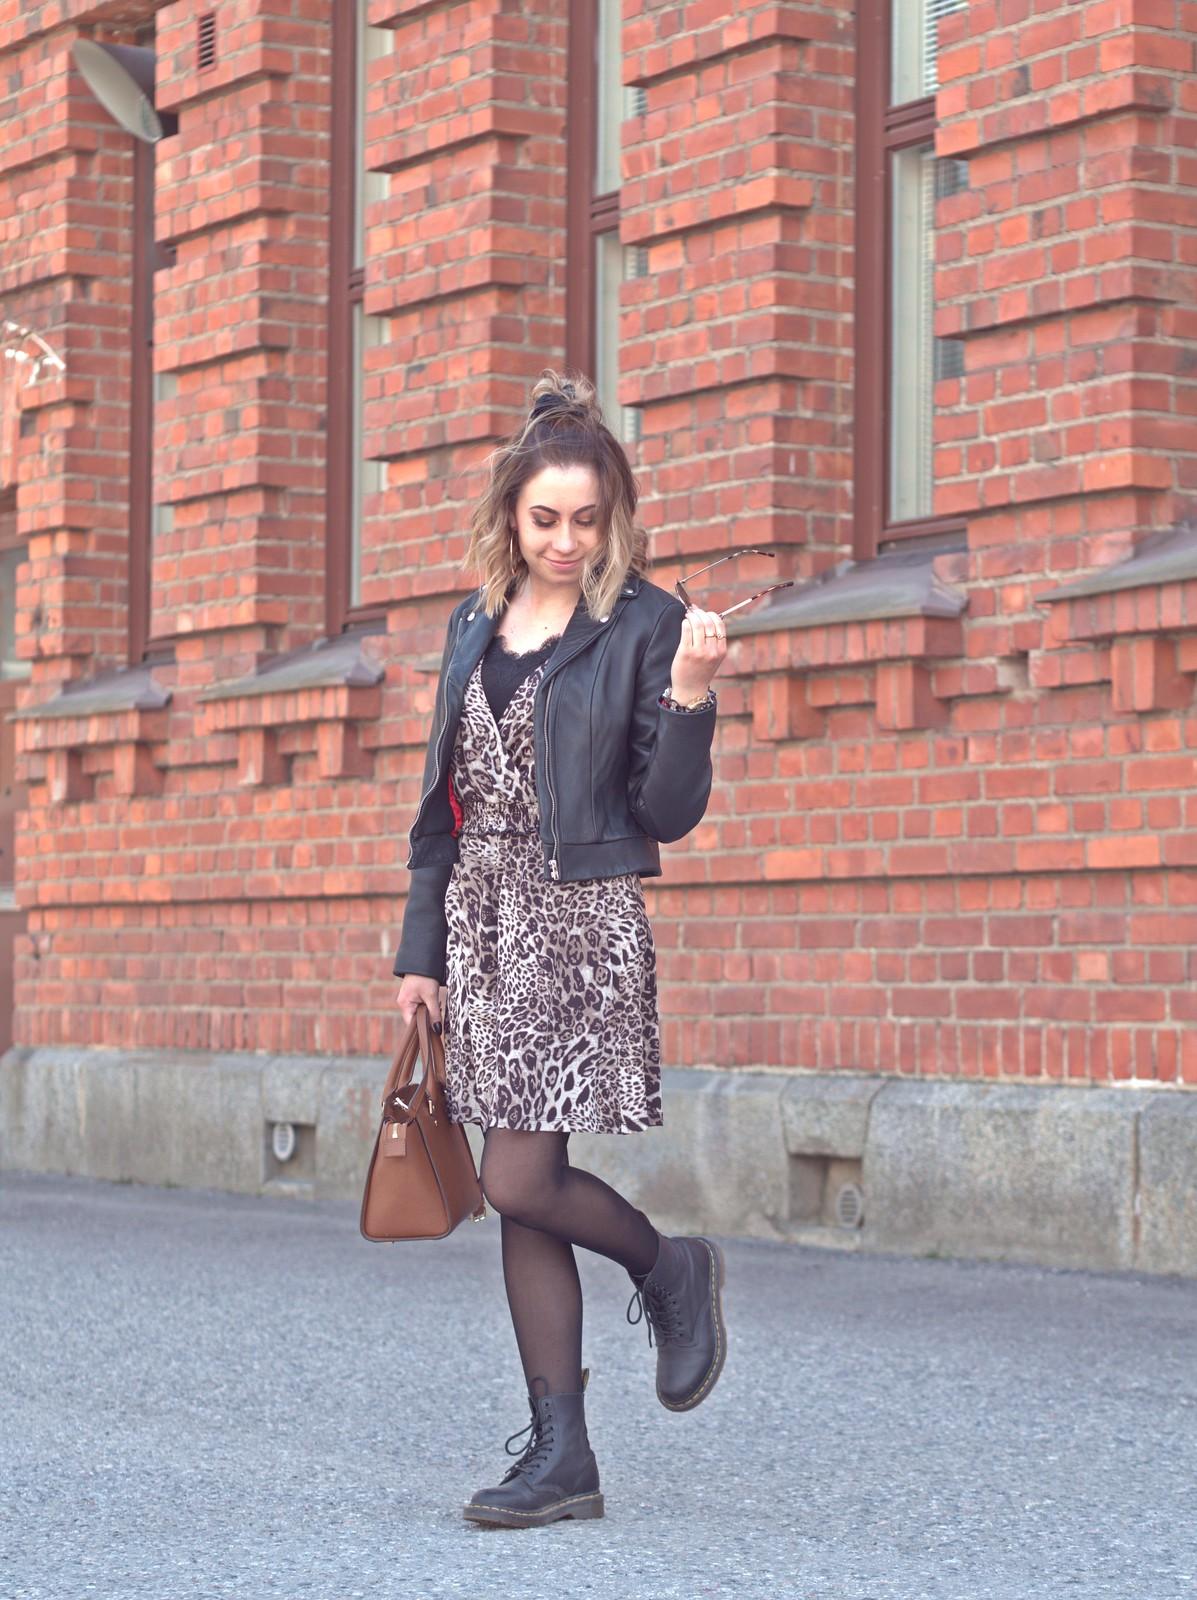 leopard dress outfit ideas